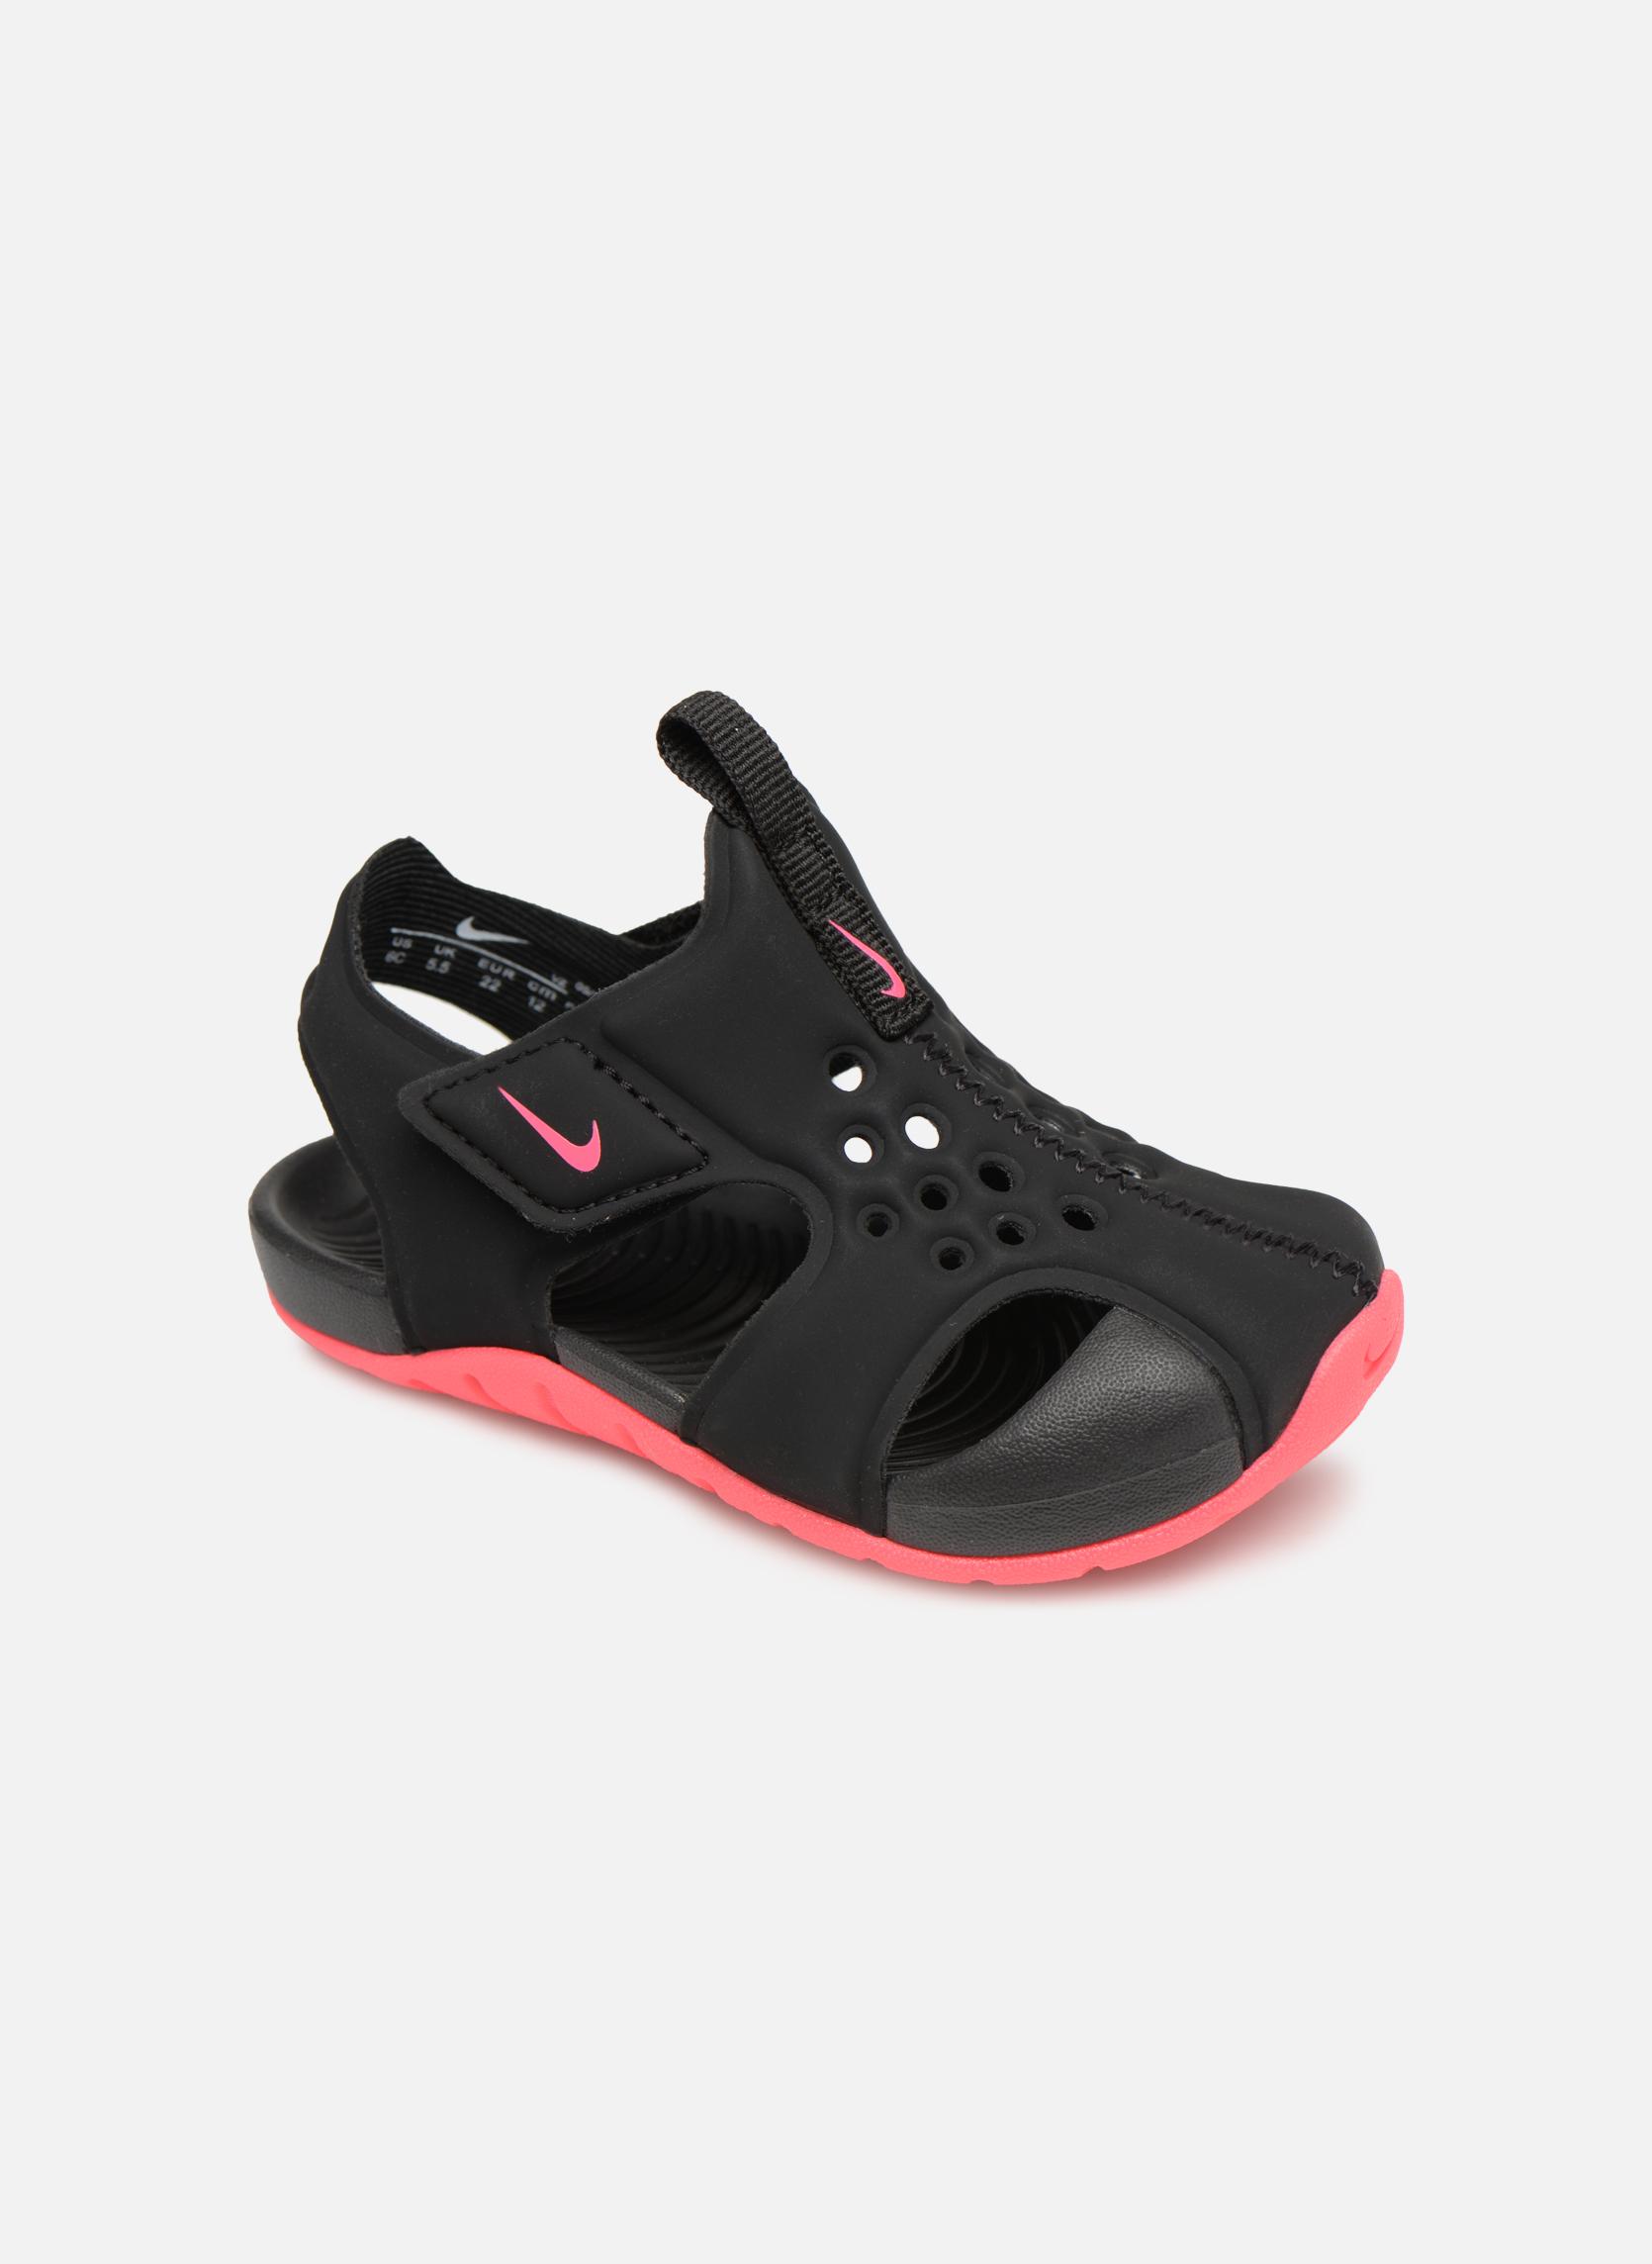 new styles 5b46e a254a Sandalen Nike Sunray Protect 2 (Td) by Nike